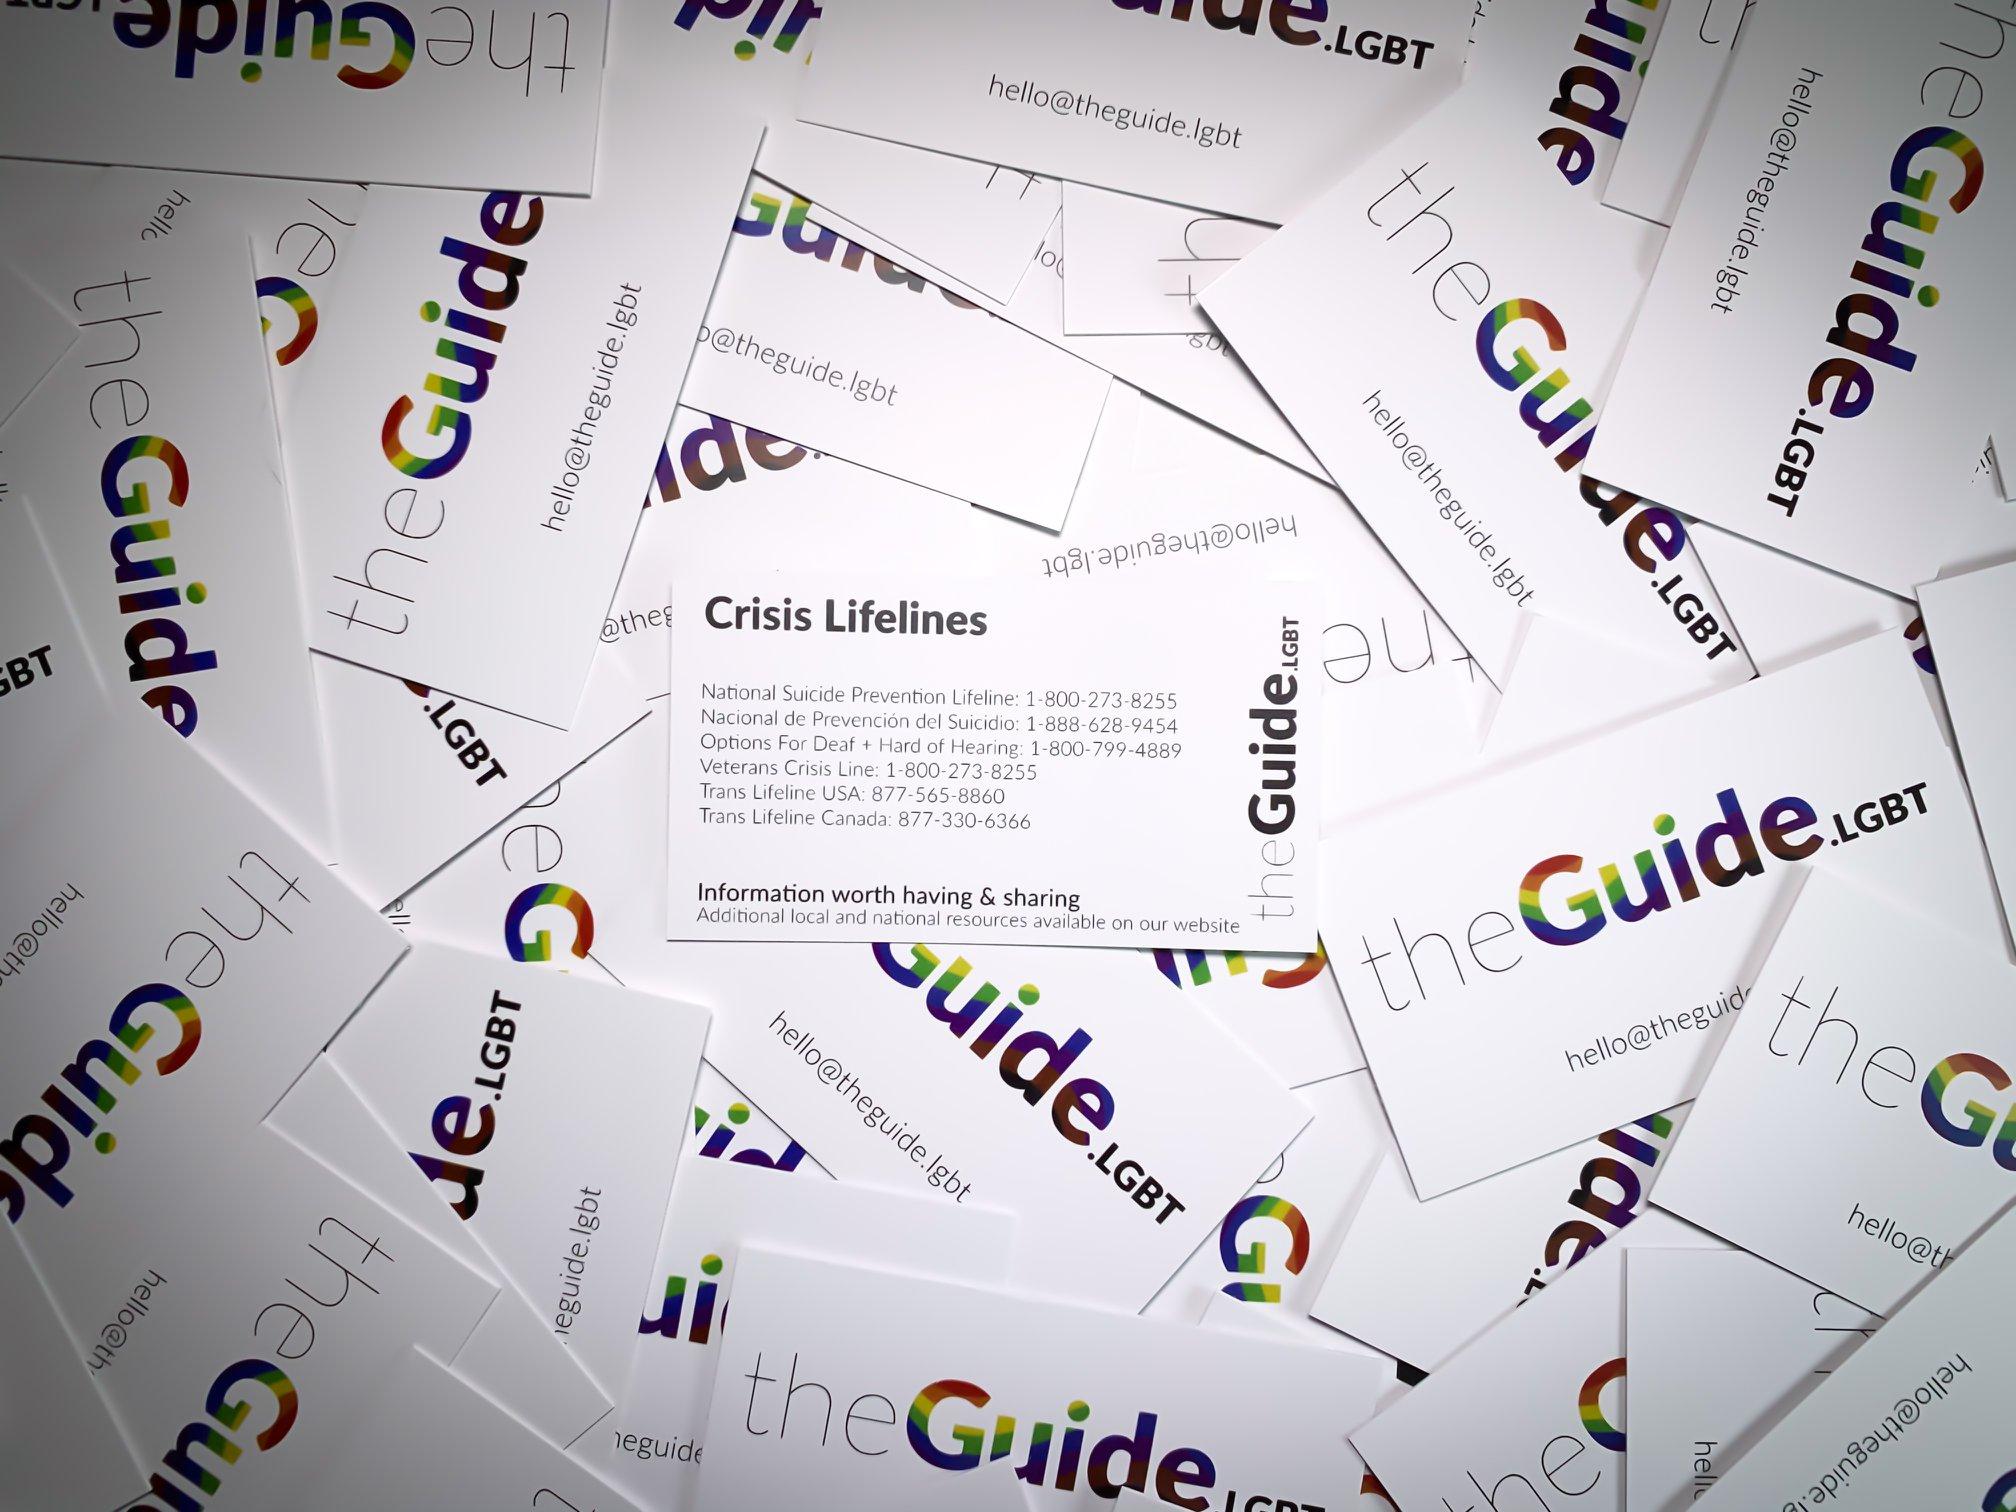 theGuide.LGBT